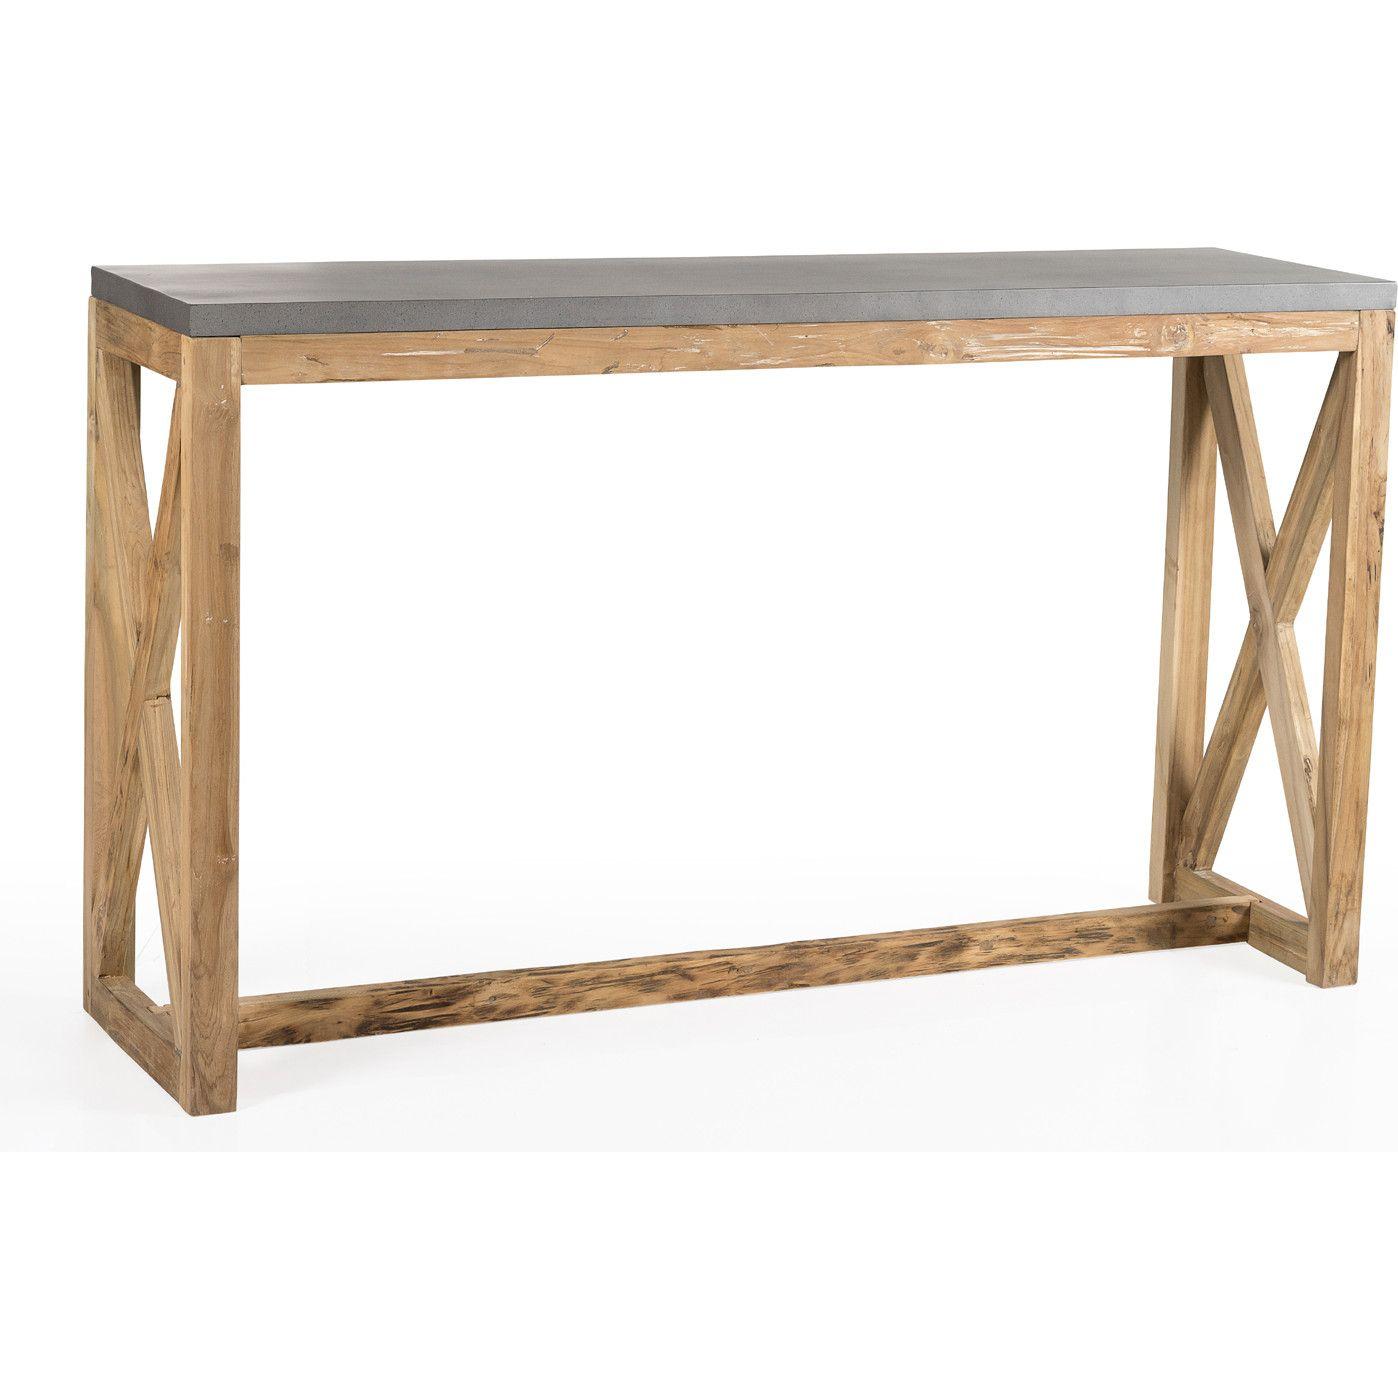 Marvelous Padmas Plantation Valencia Console Table Metal Recycled Inzonedesignstudio Interior Chair Design Inzonedesignstudiocom